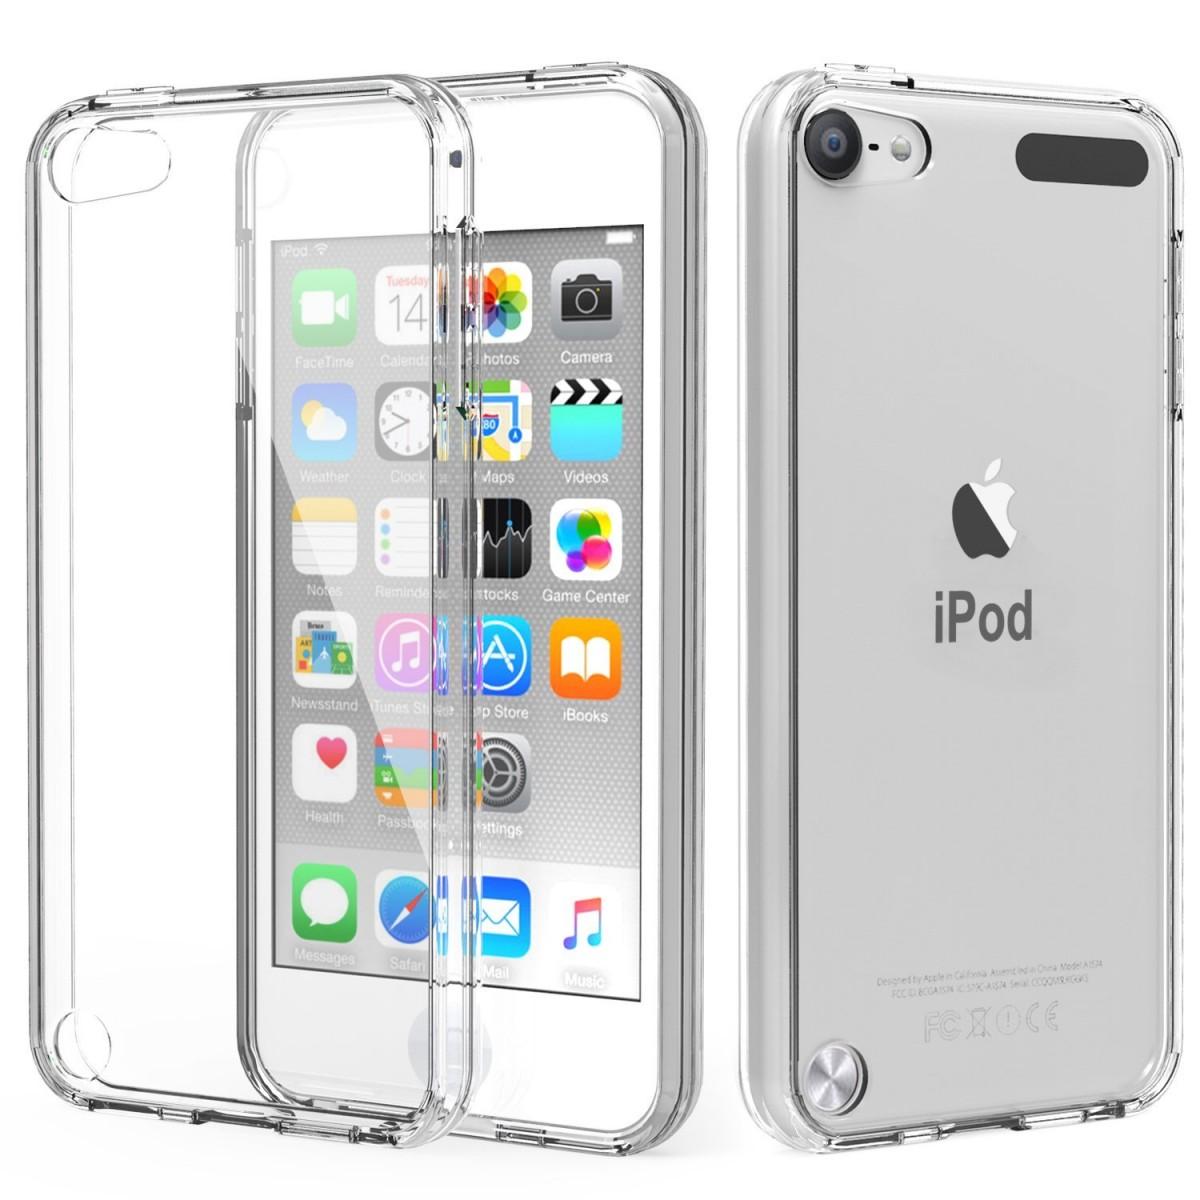 Pouzdro iMore Silicone Case na iPod Touch 5 - čiré 6424b6ed581